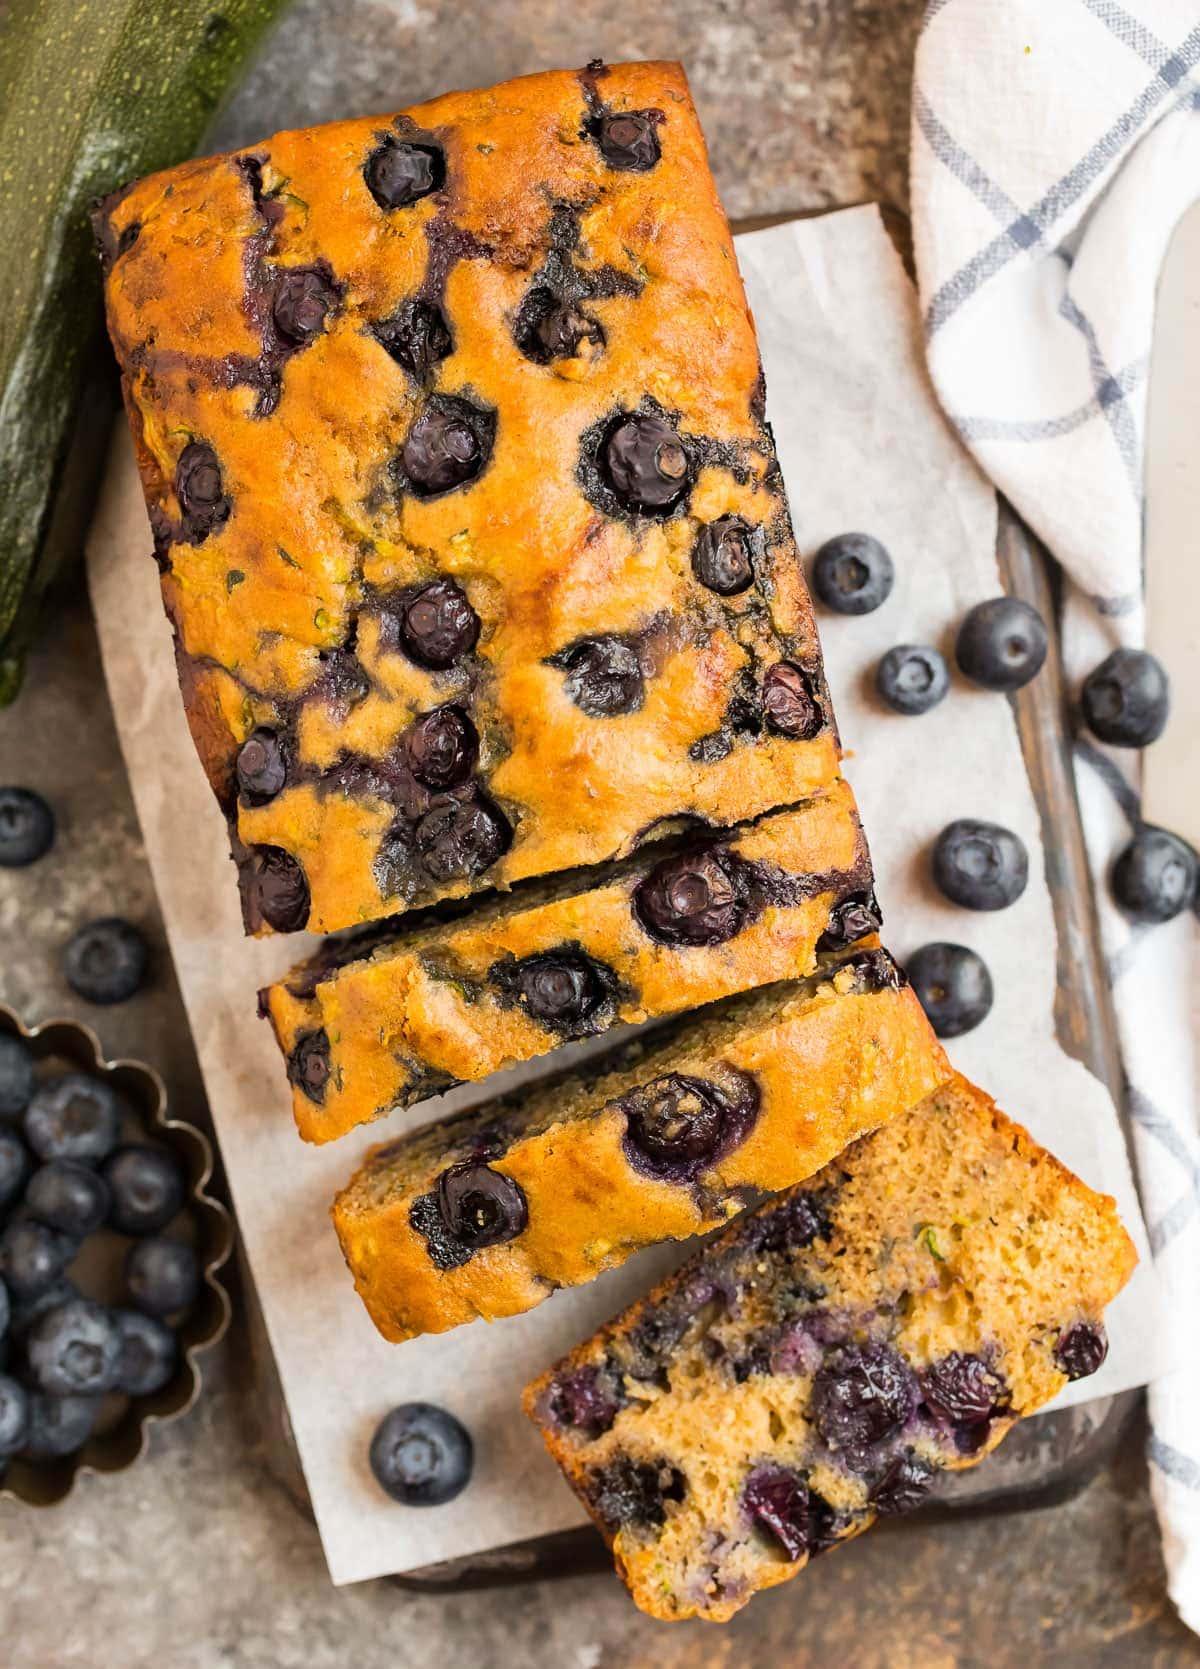 Easy blueberry zucchini bread cut into slices